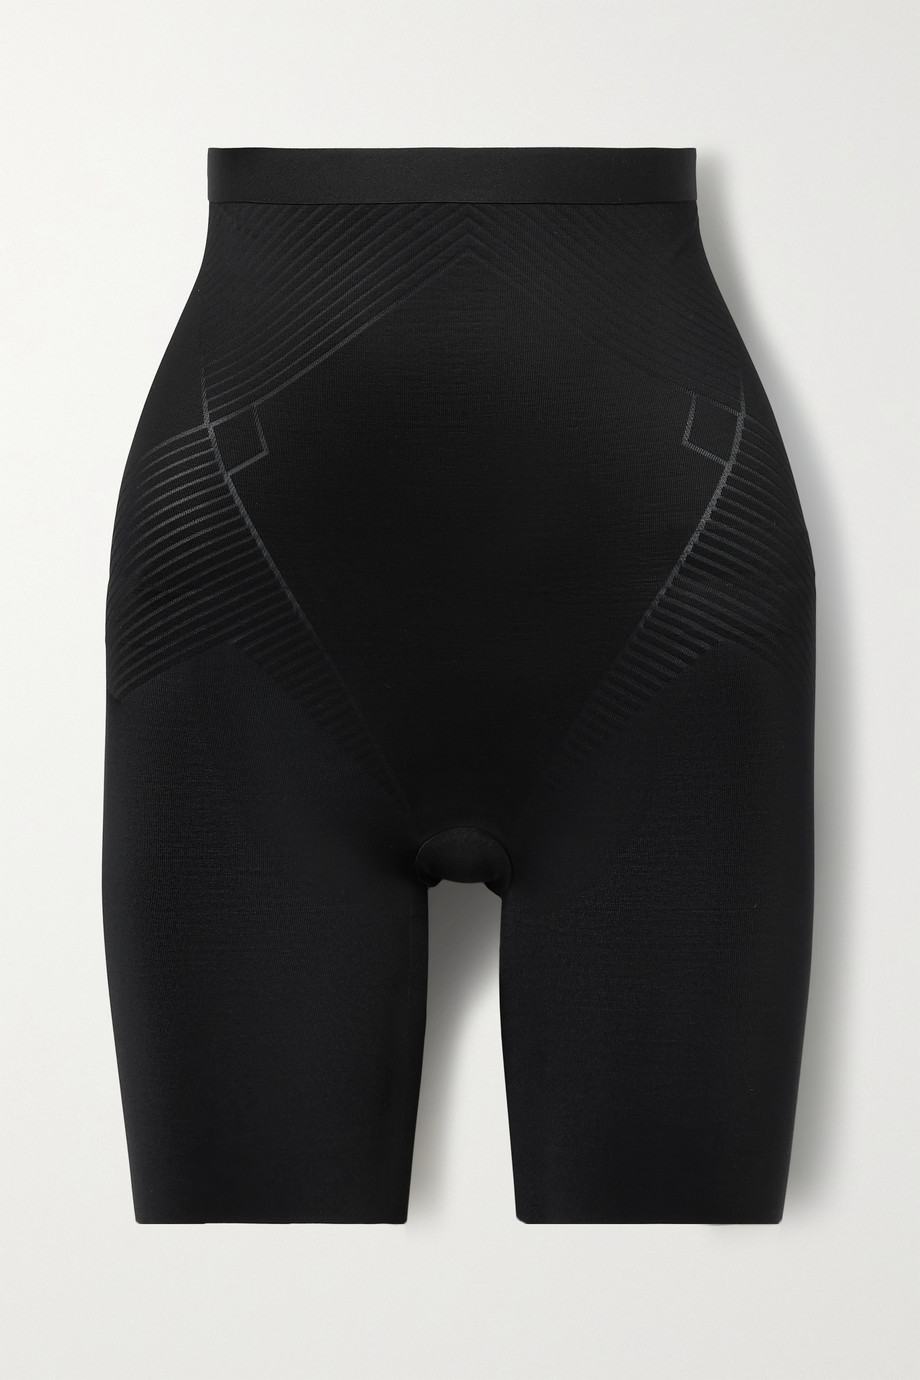 Spanx Thinstincts 2.0 high-rise shorts